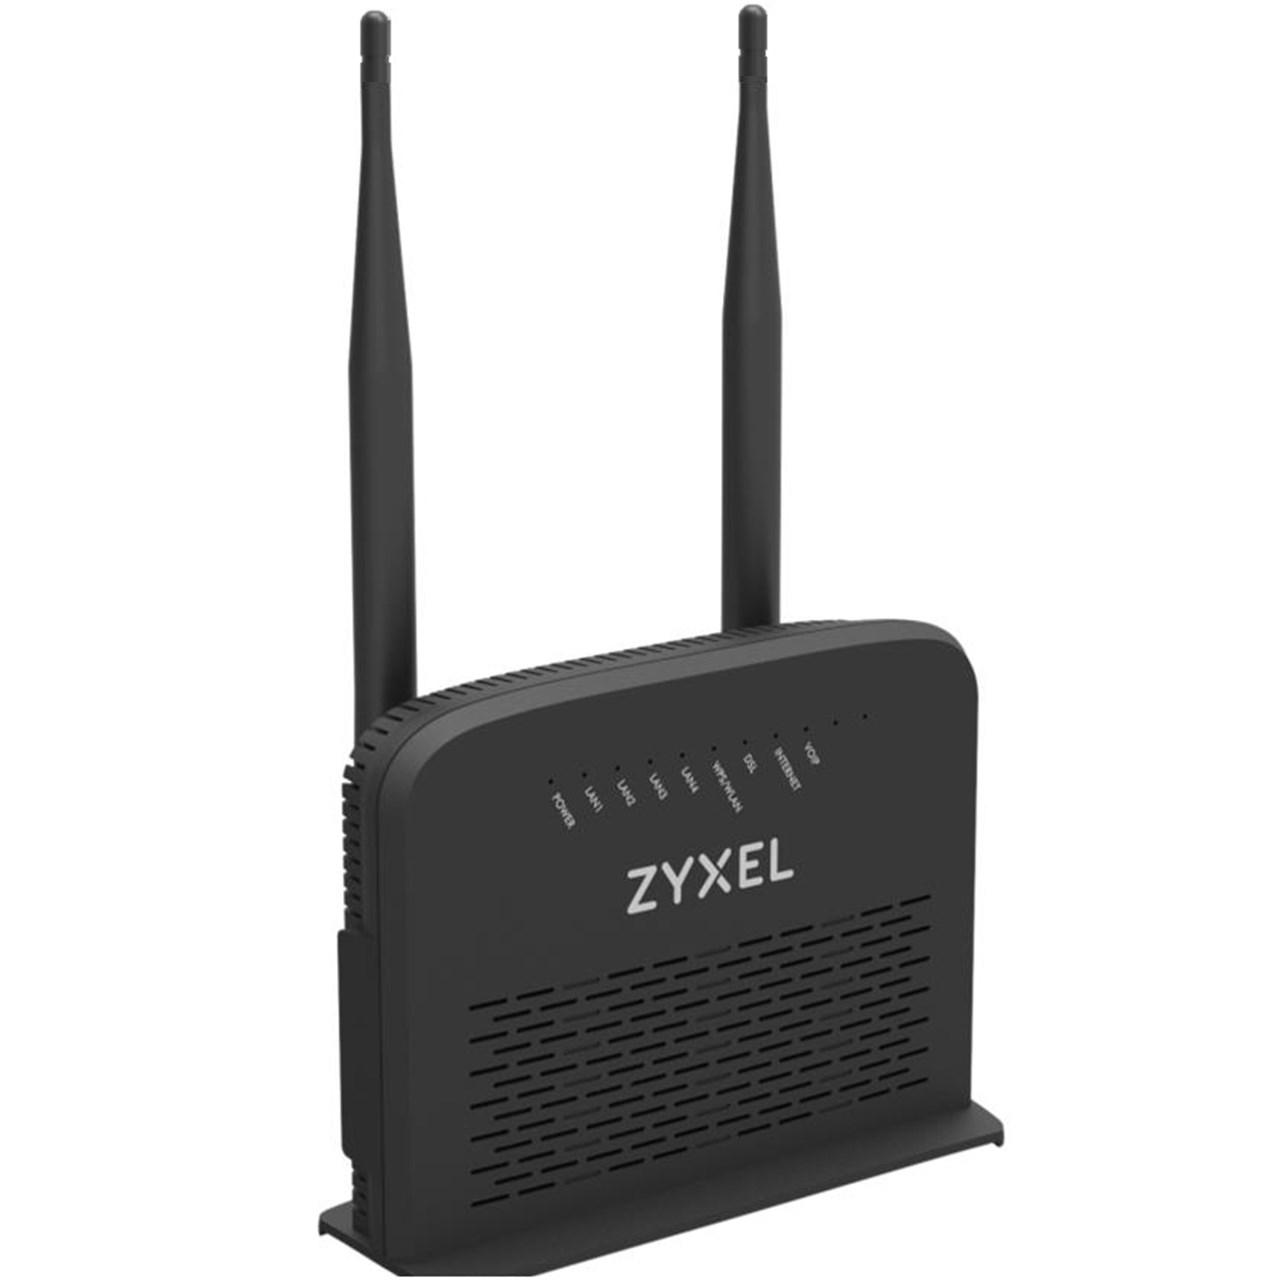 مودم روتر بی سیم VDSL/ADSL زایکسل مدل VMG5301-T20A